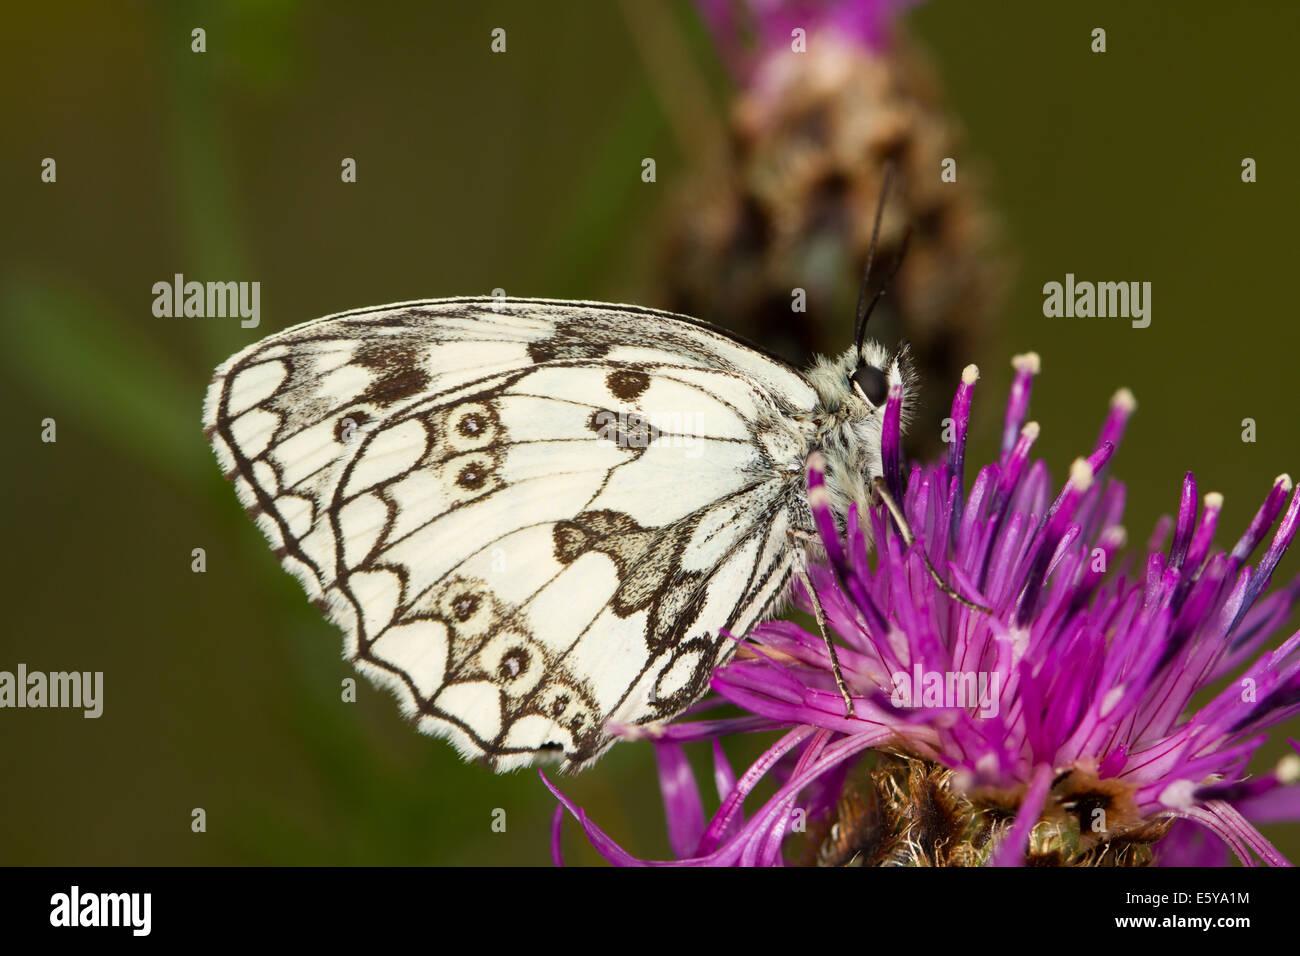 Marbled White (Melanargia galathea) butterfly feeding on a Greater Knapweed flower - Stock Image